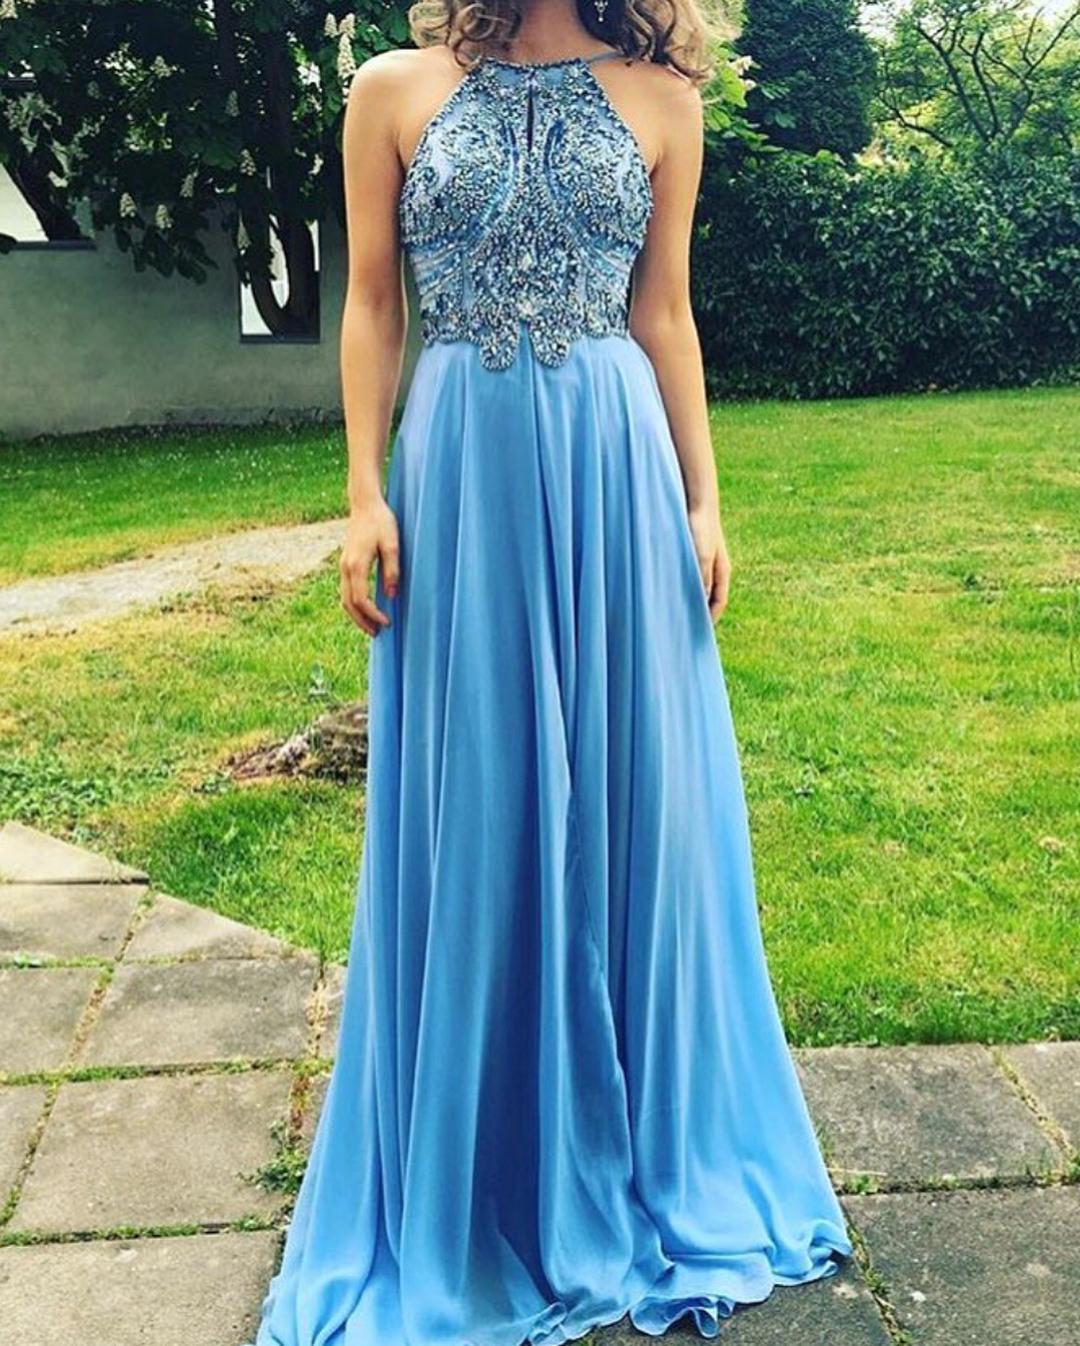 Schön Blaues Abendkleid Lang GalerieAbend Erstaunlich Blaues Abendkleid Lang Vertrieb